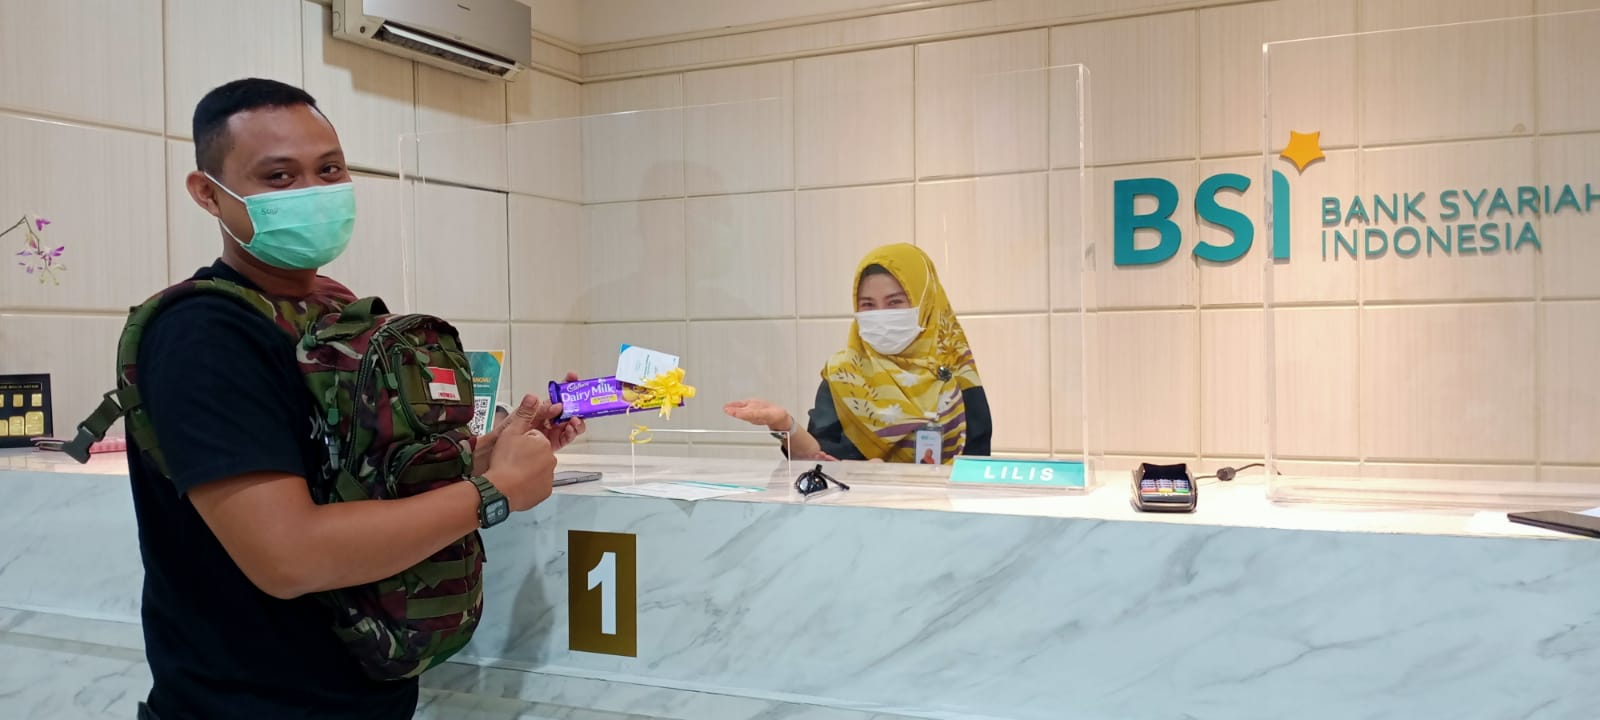 Peringati Hari Pelanggan, Bank Syariah Indonesia Region 2 Medan  Perkuat Ultimate Service melalui Transformasi Digital